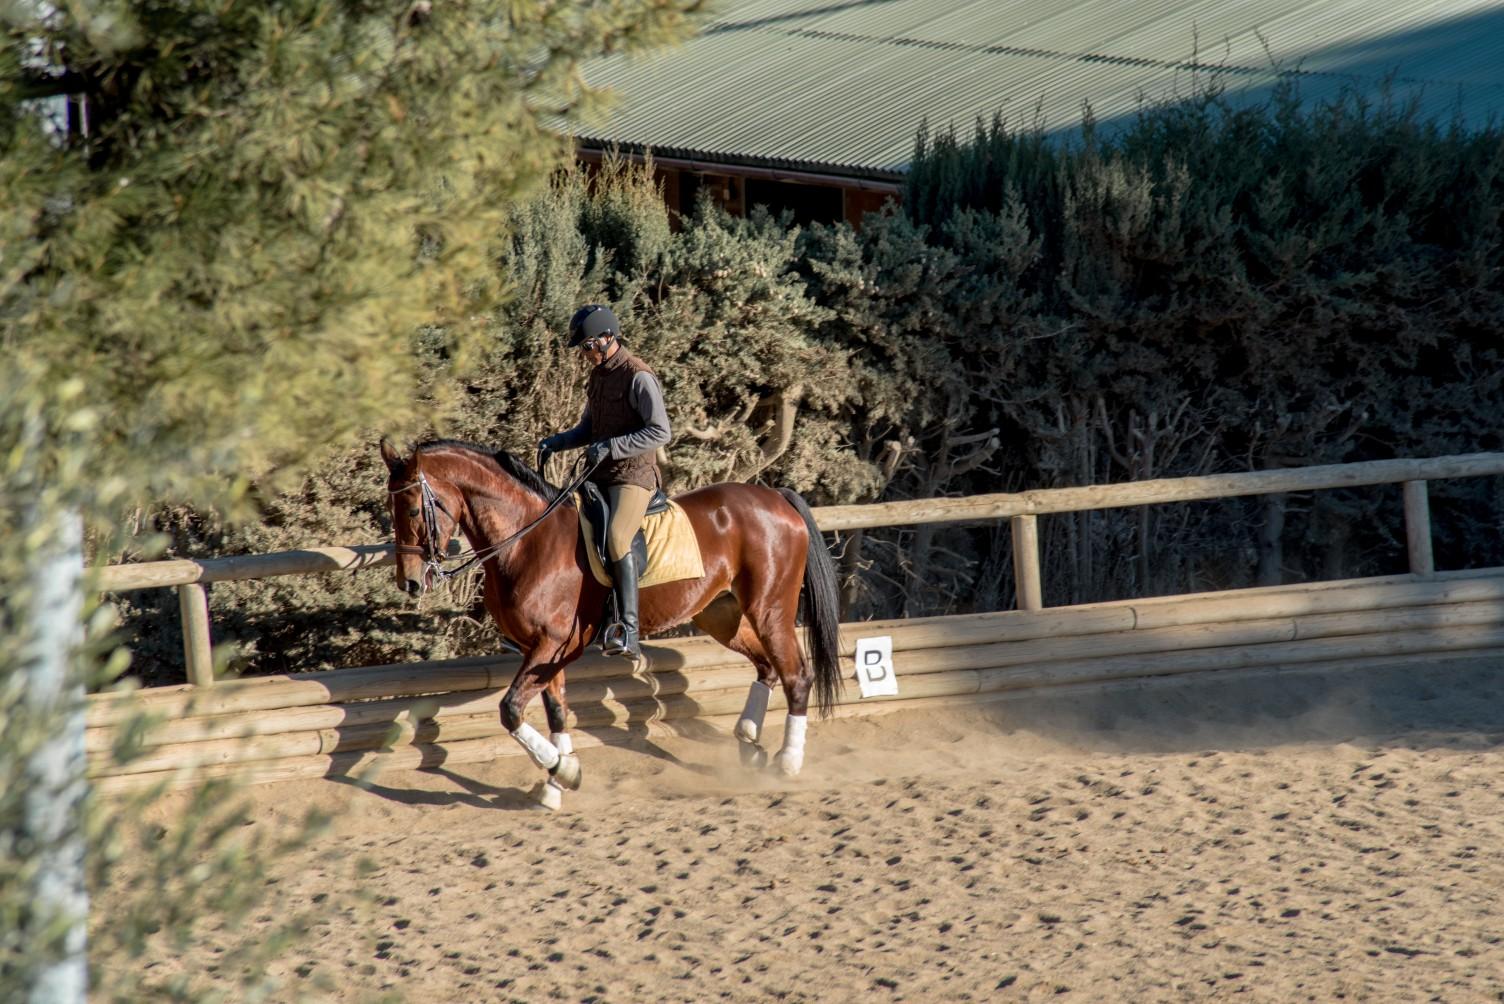 Horse riding in Montjuic Barcelona